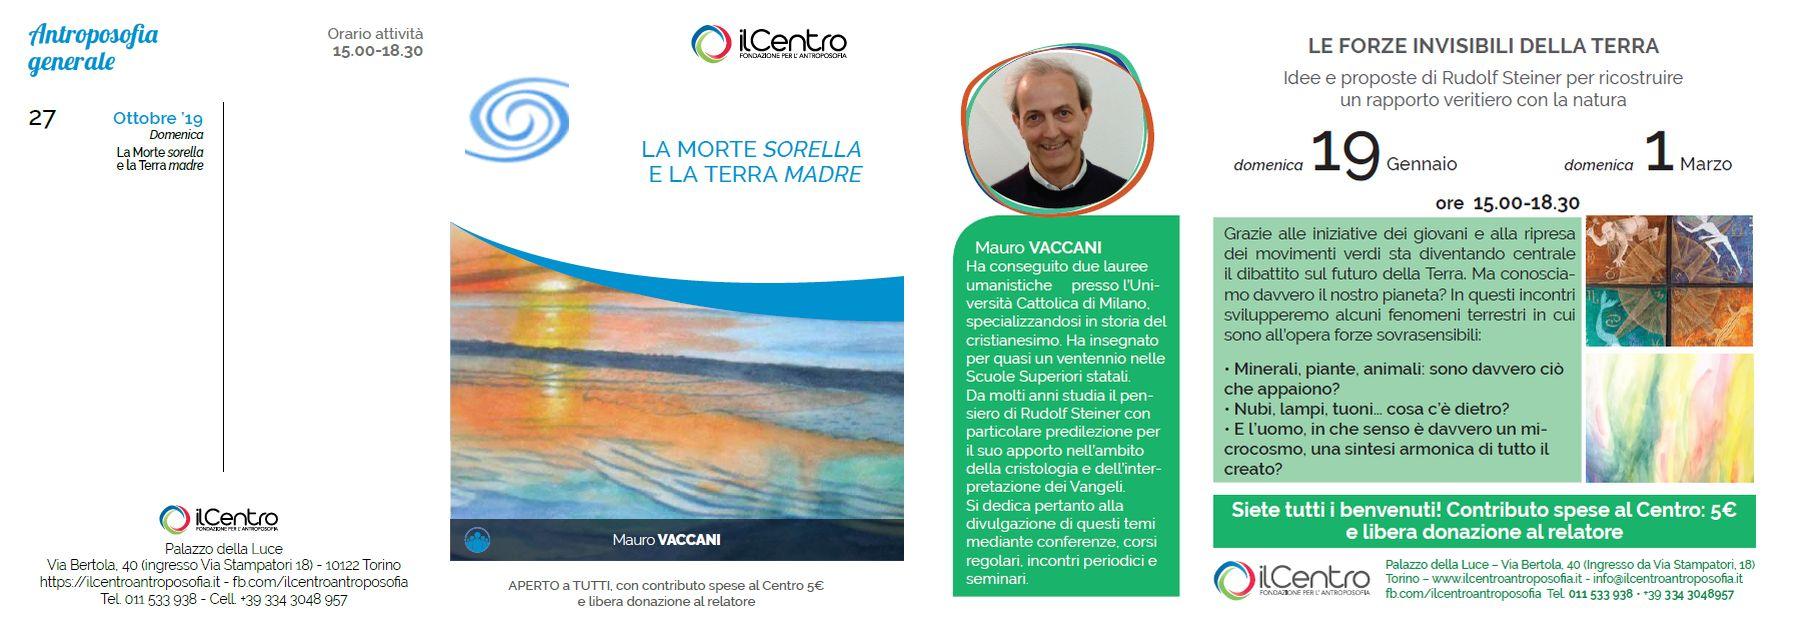 Calendario Mauro Vaccani 2019-2020